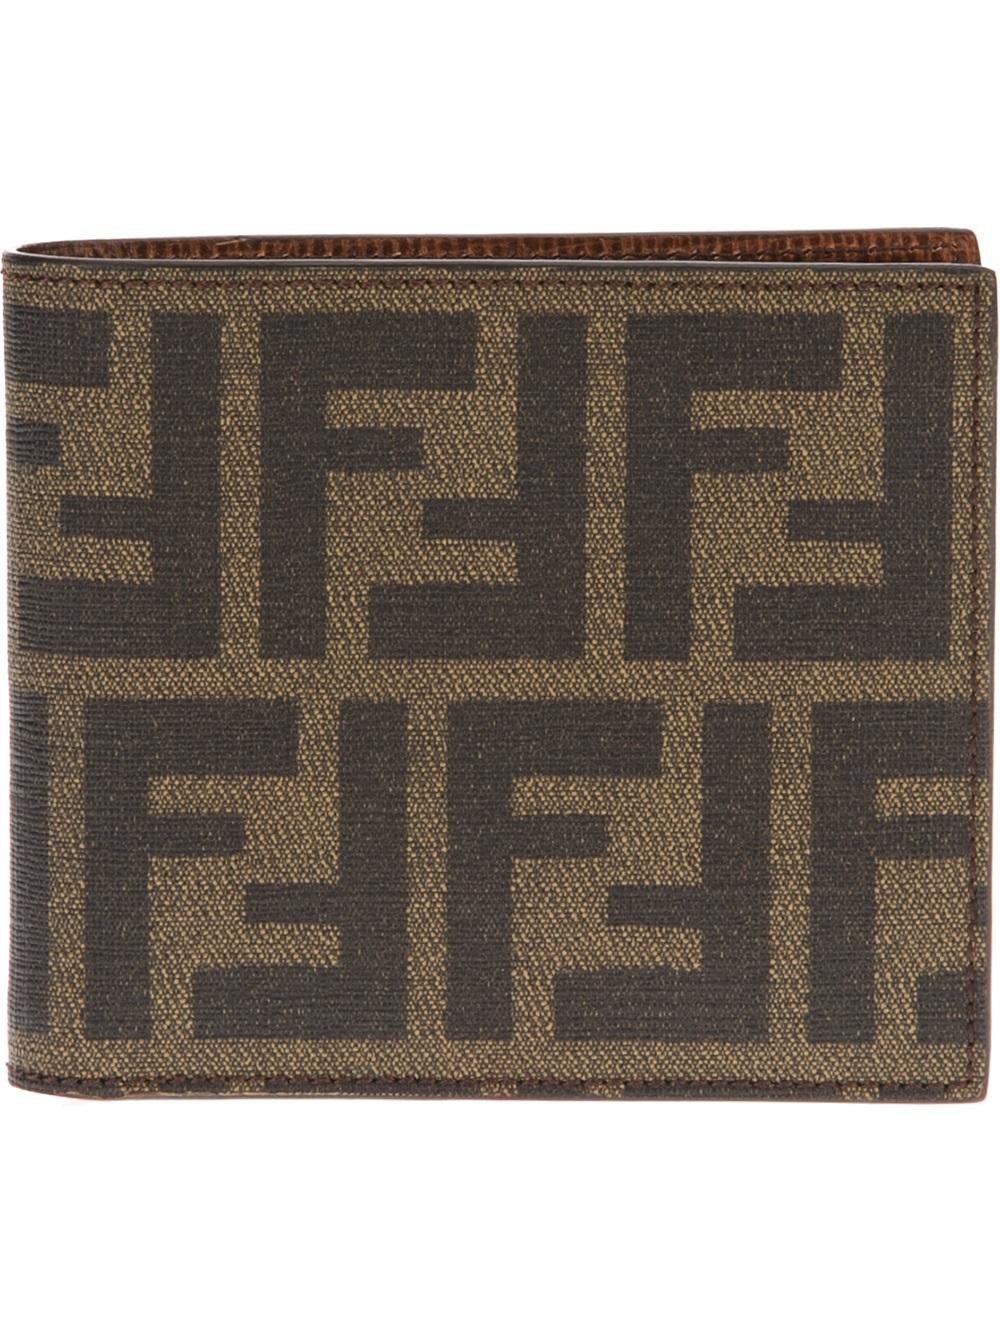 Fendi Monogram Print Bifold Wallet In Brown For Men Lyst